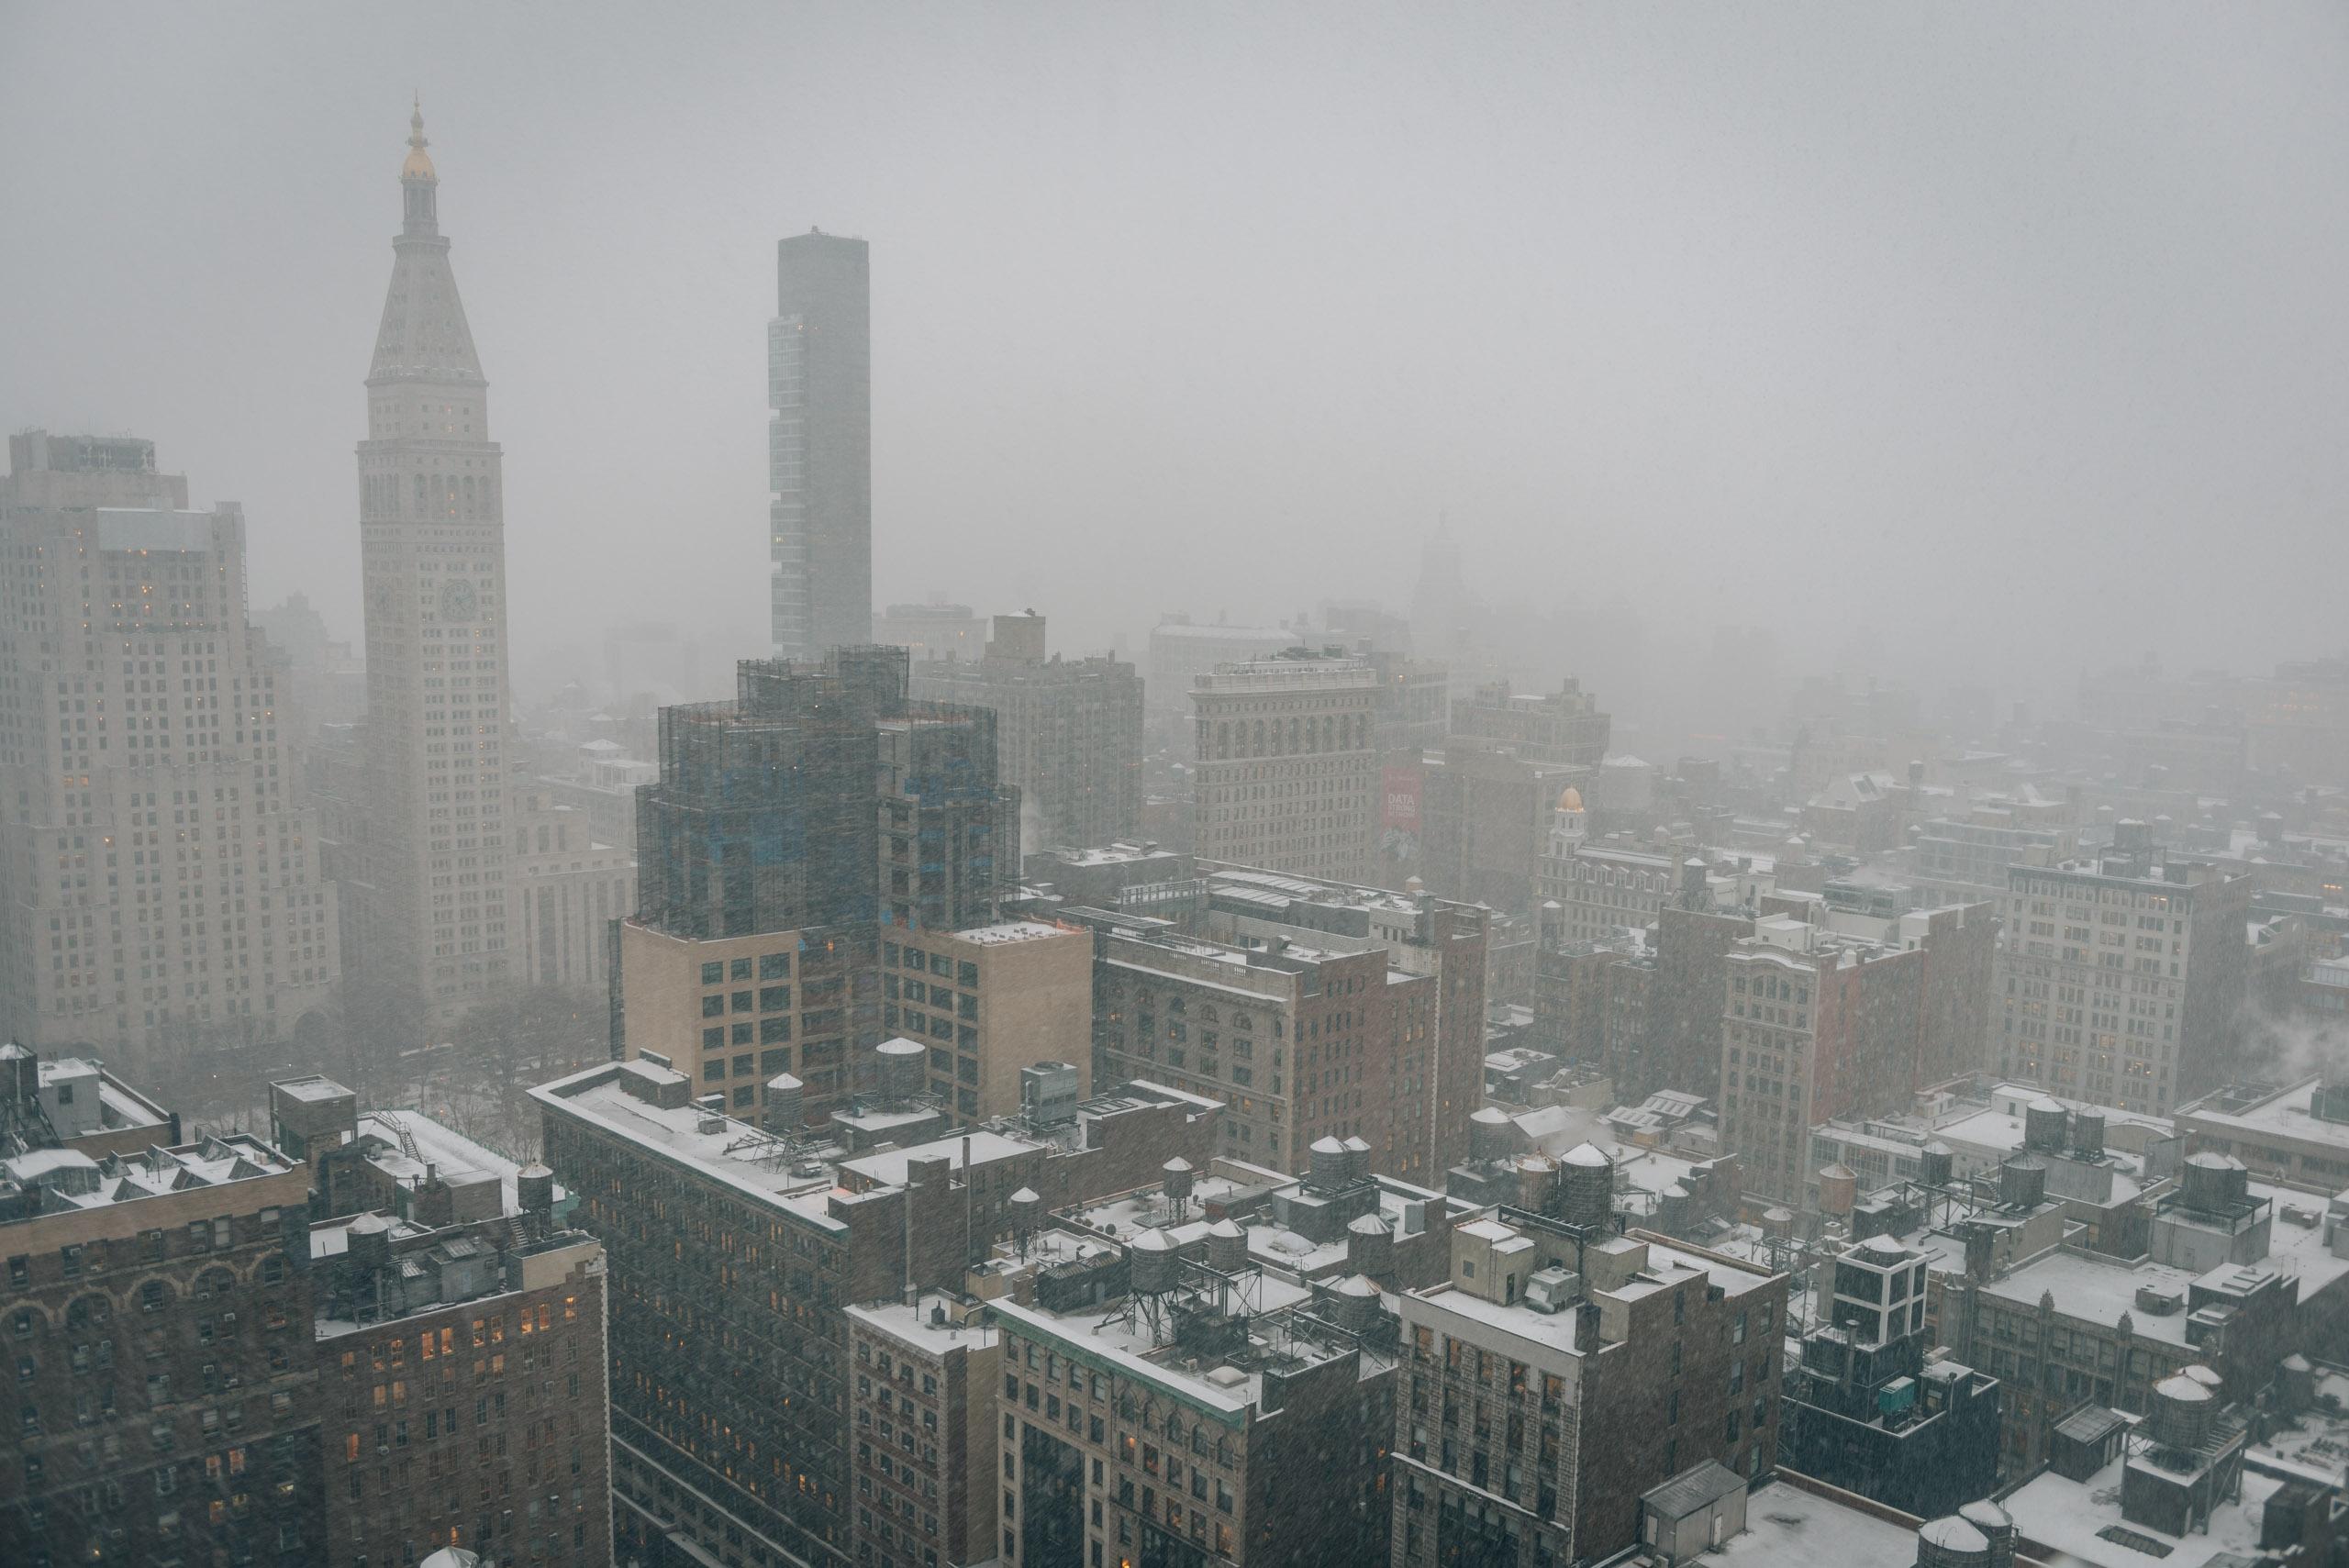 A Snowy Day over Flatiron